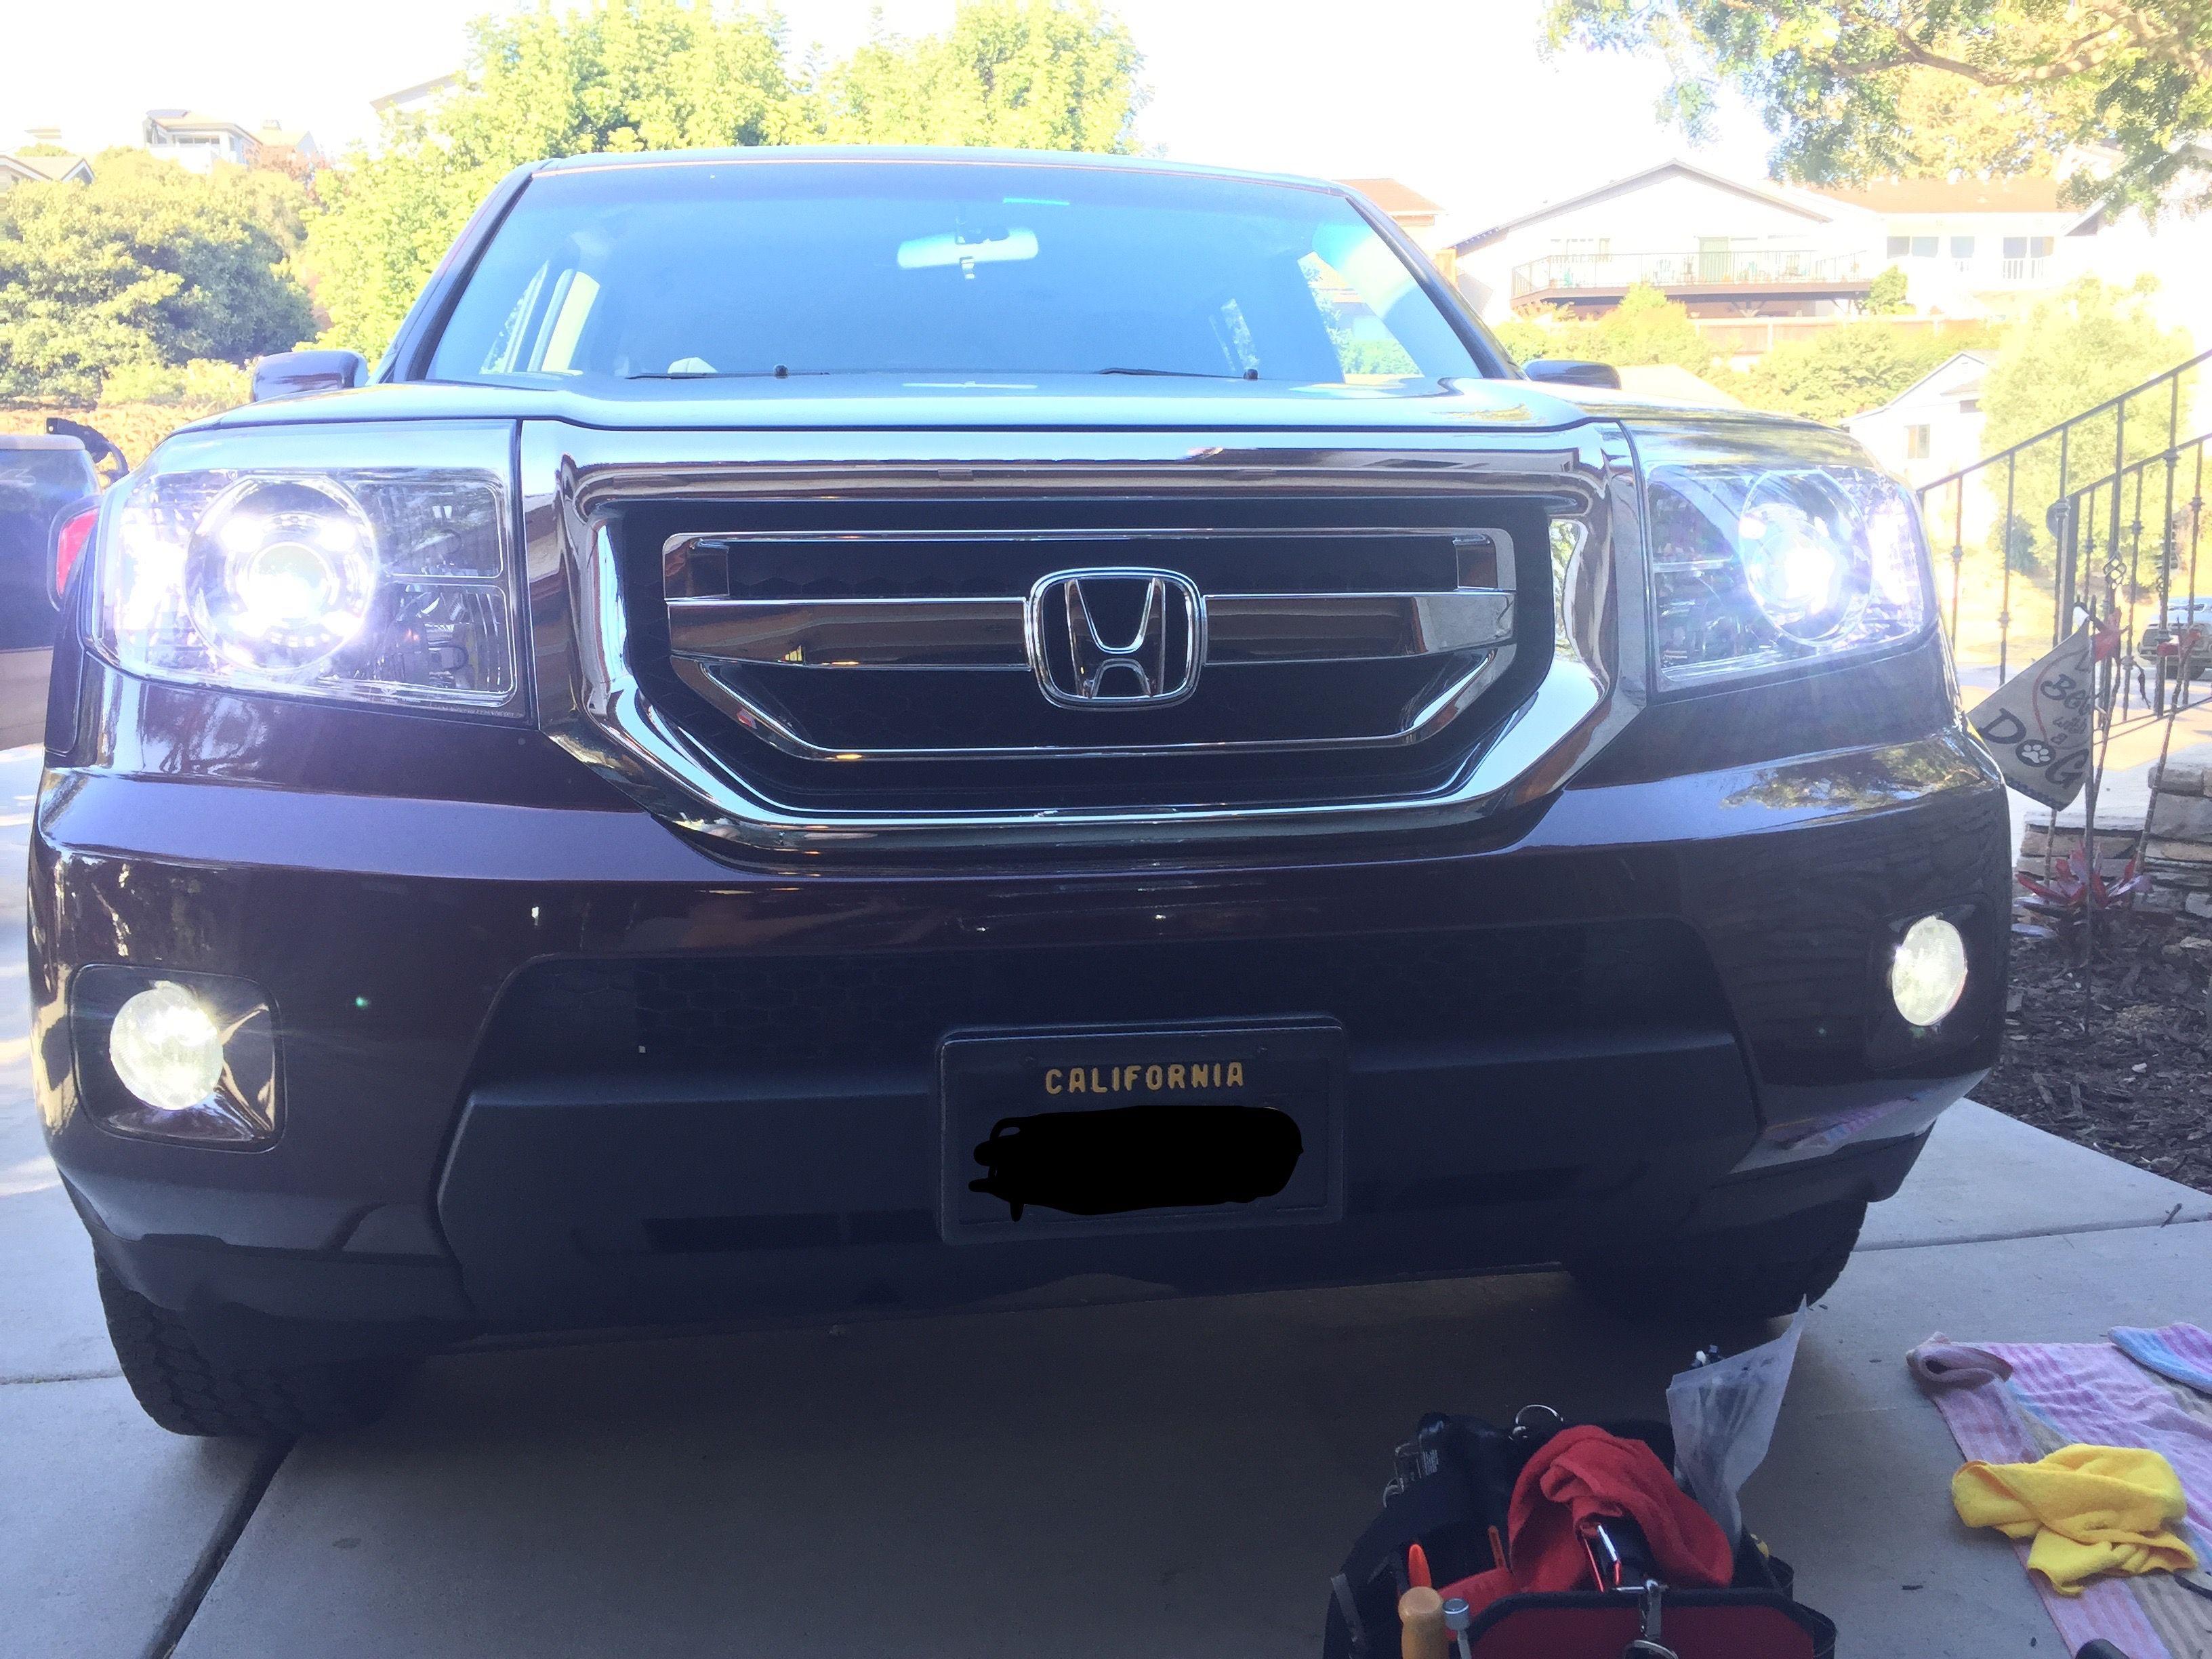 2011 Honda Pilot: Grill, Projector Headlights, LED Running Lights, Roof  Rails,